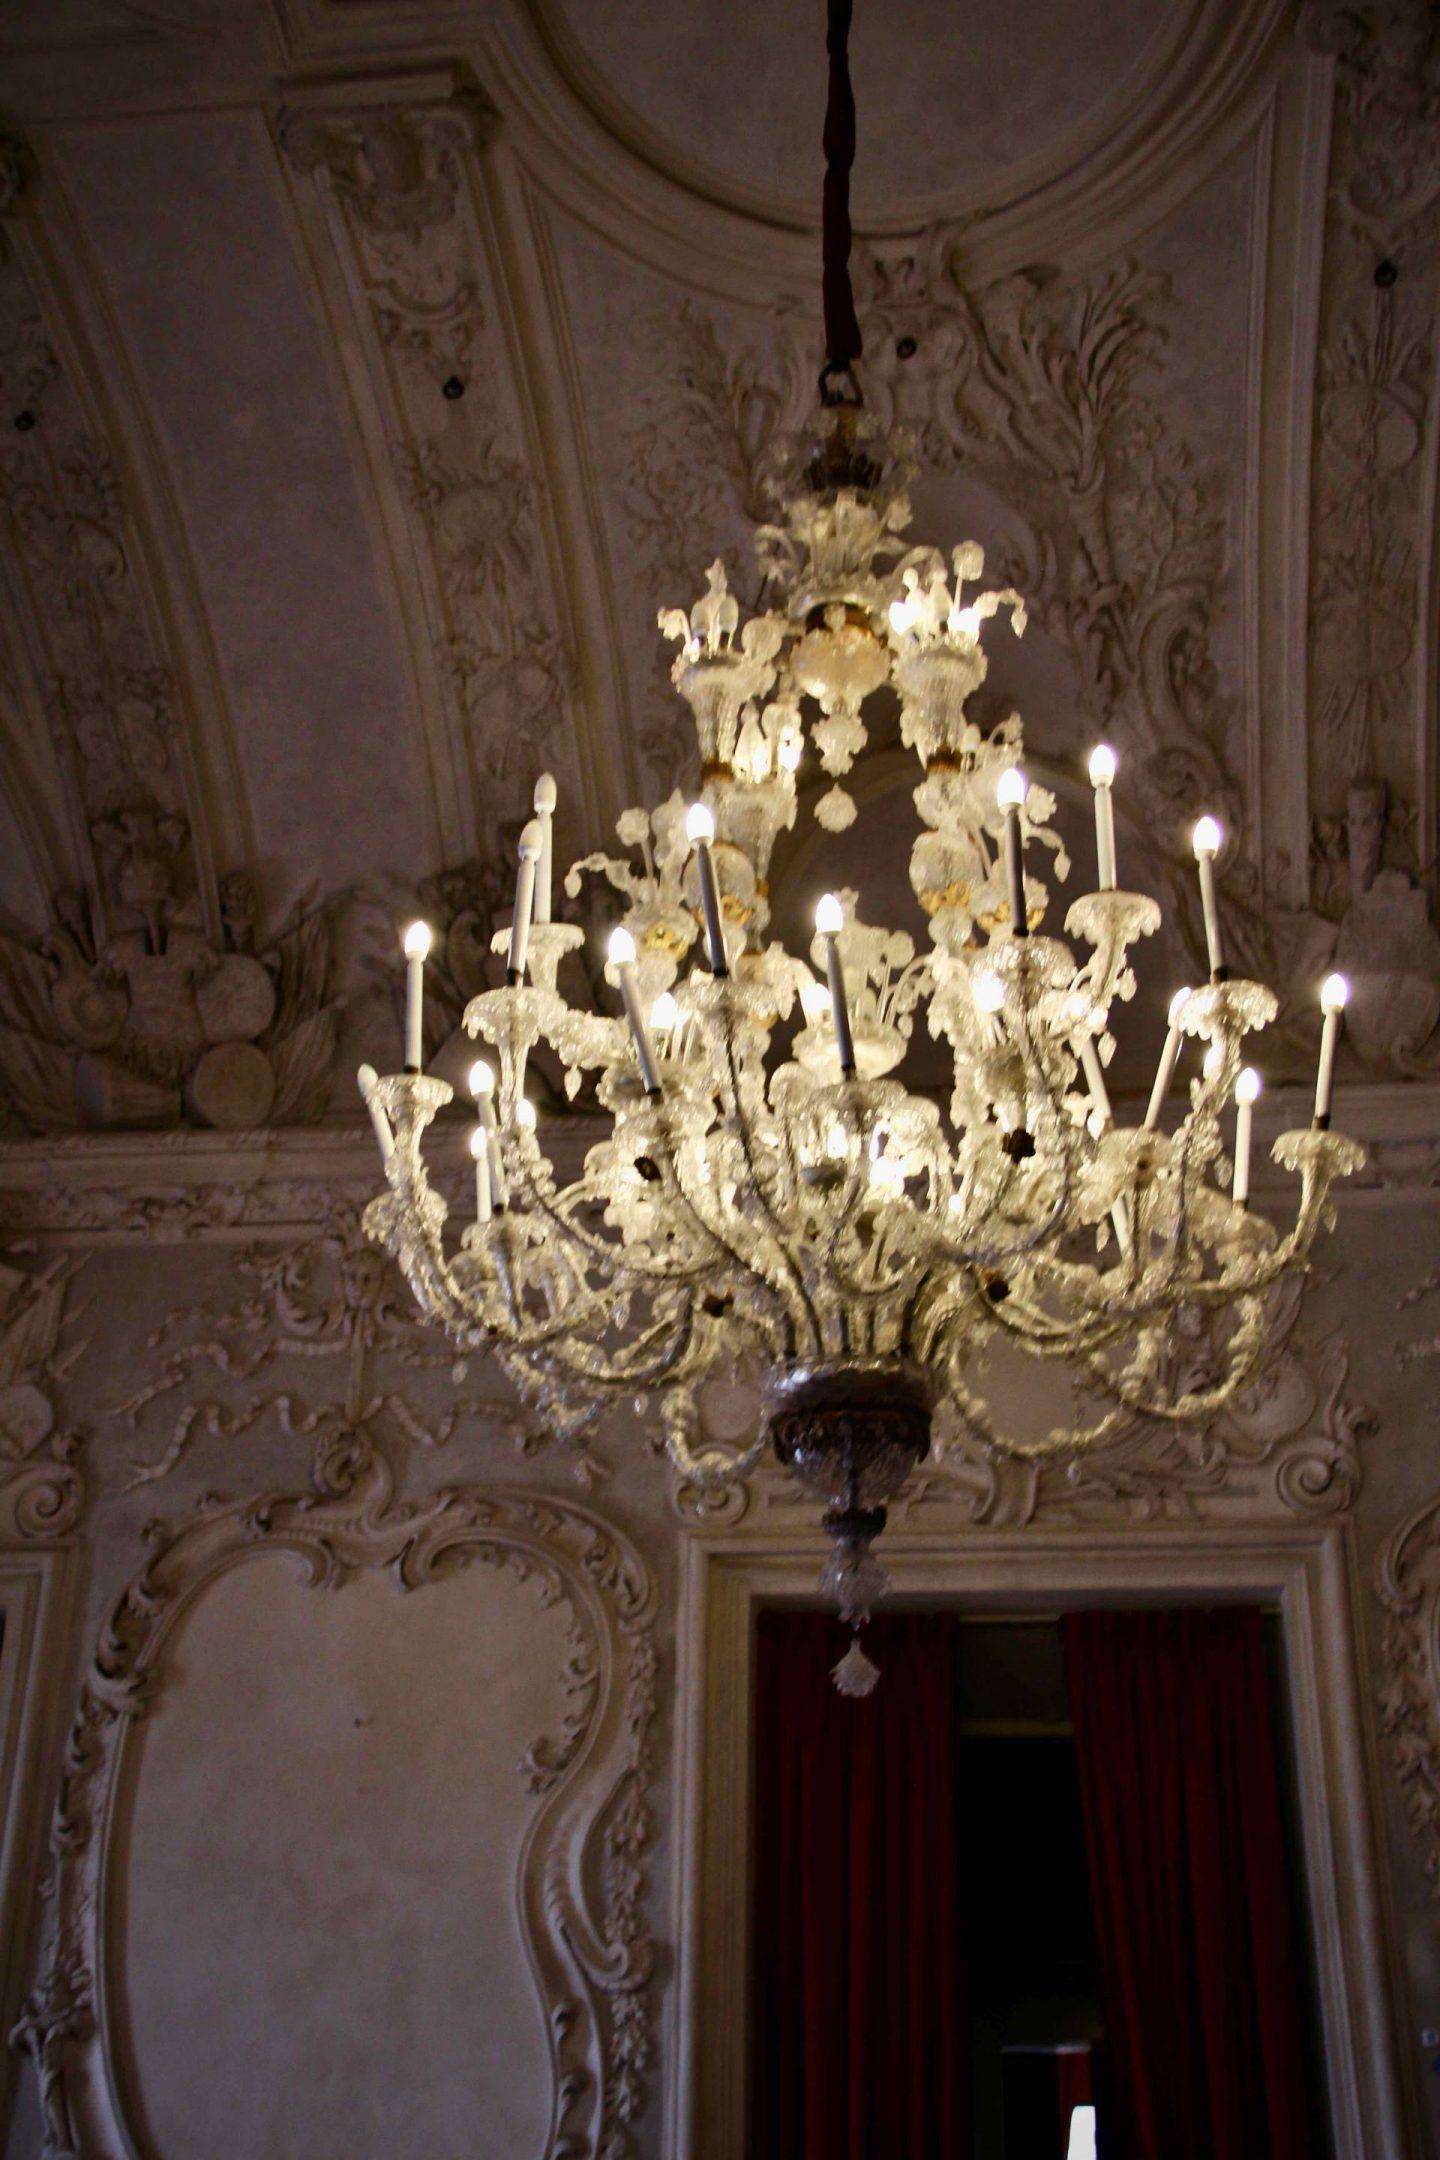 Venaria Reale Palace Torino Italy | 7-day Torino Italy Travel Itinerary | The Spectacular Adventurer